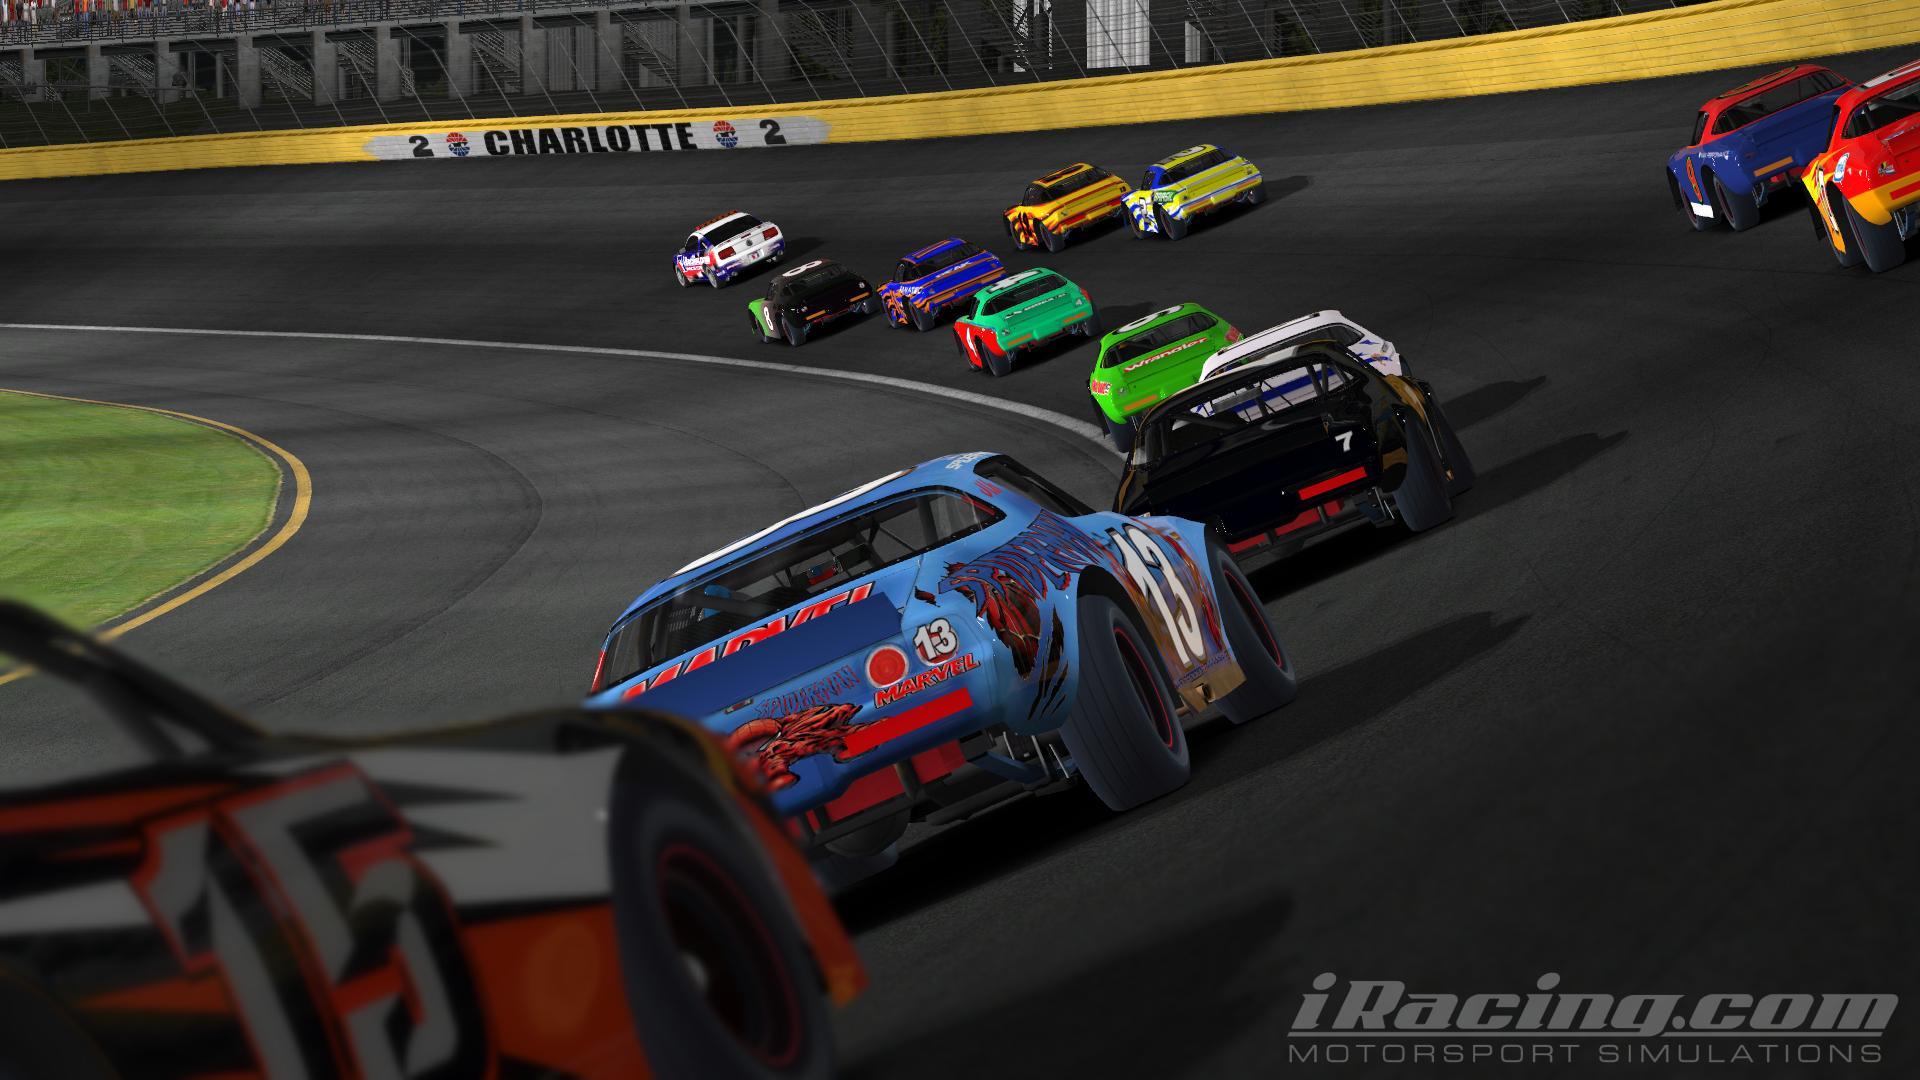 Street Stock @ Charlotte Motor Speedway